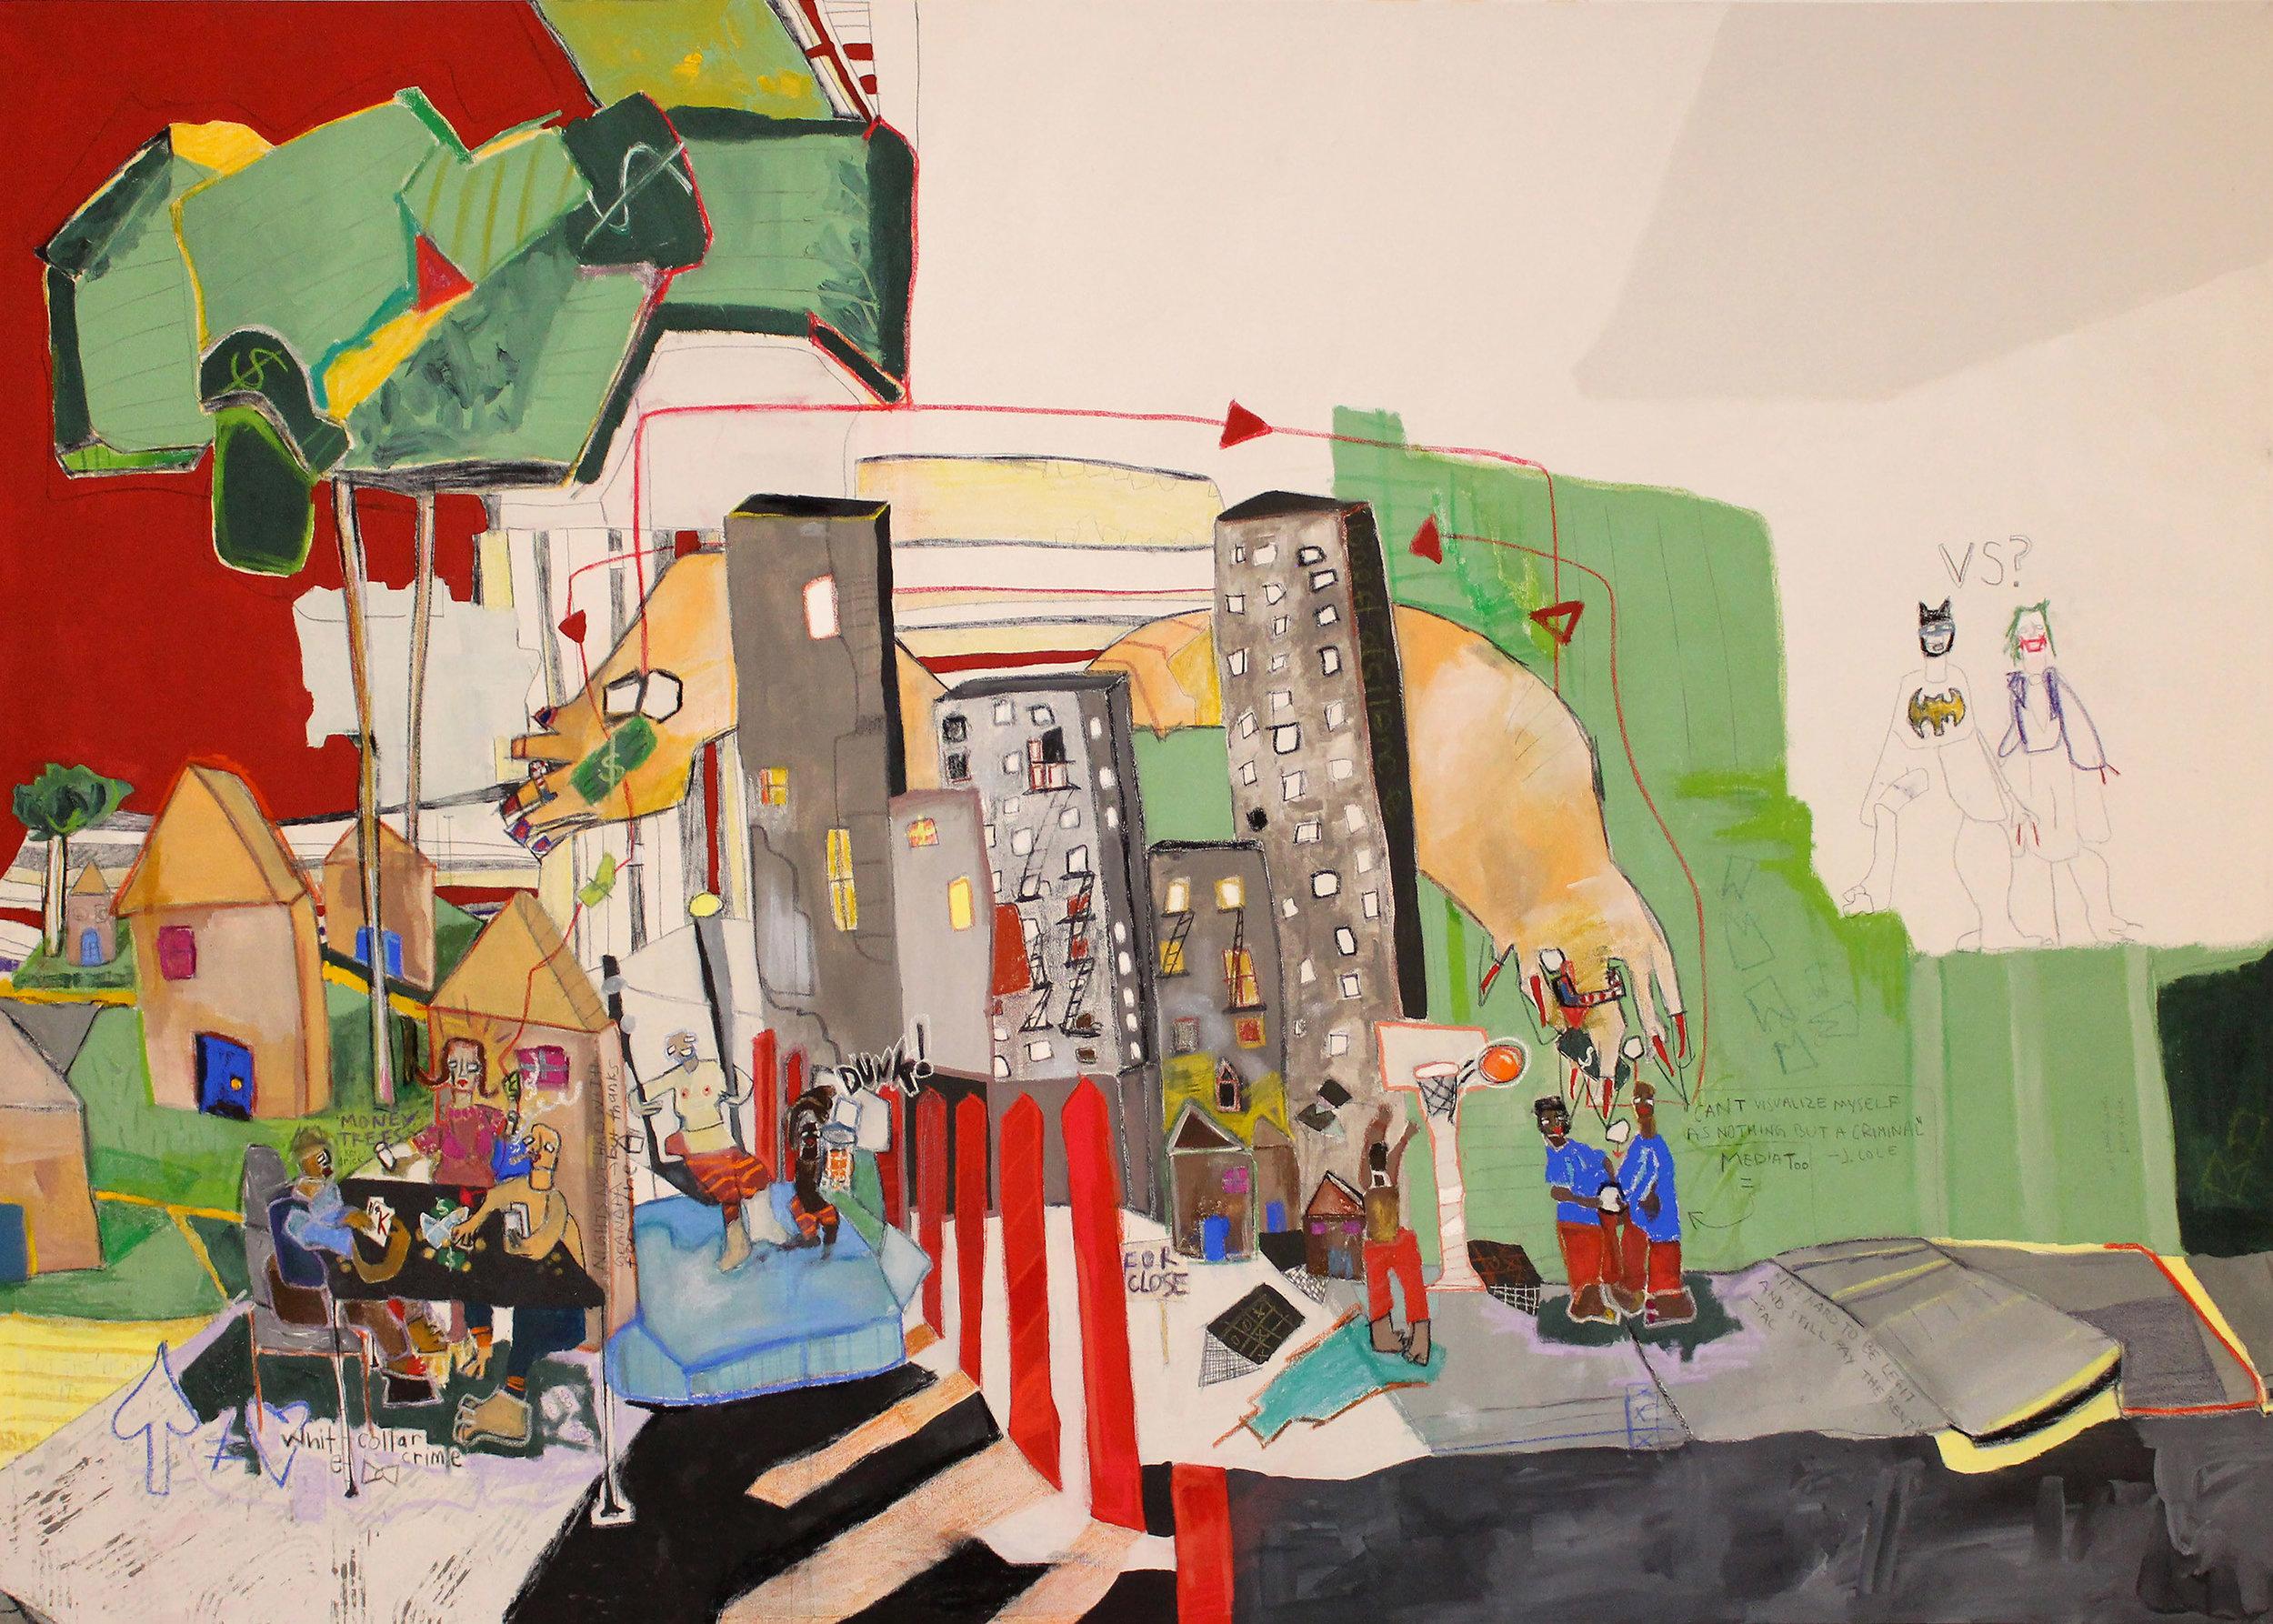 Income Inequality, Imagine Panel 1  8' x 5.5'  Panel 1 ArtPrize 9 | Grand Rapids Art Museum